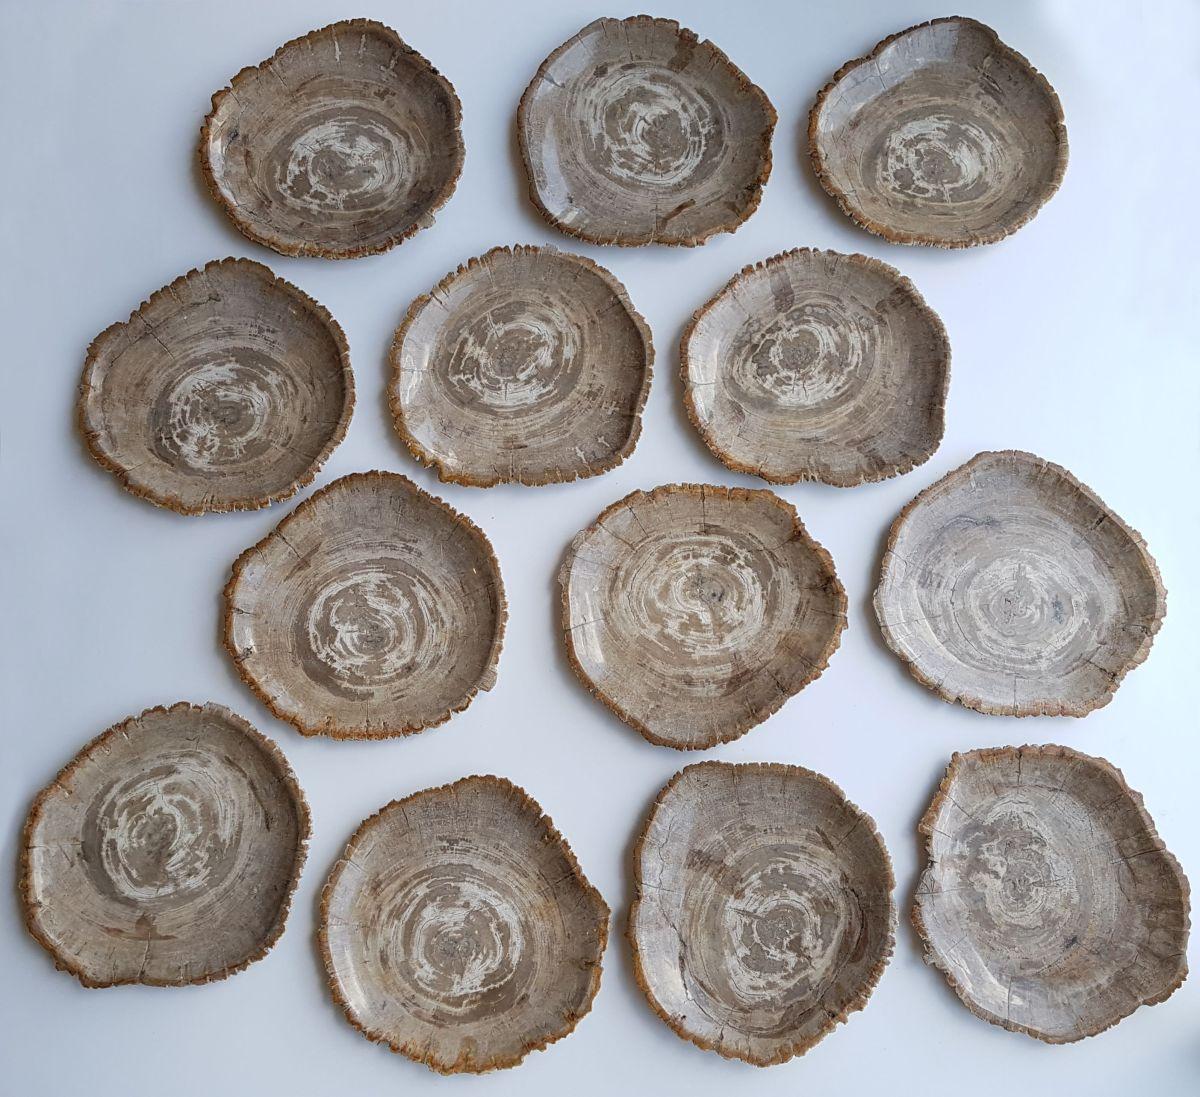 Plate petrified wood 33007m